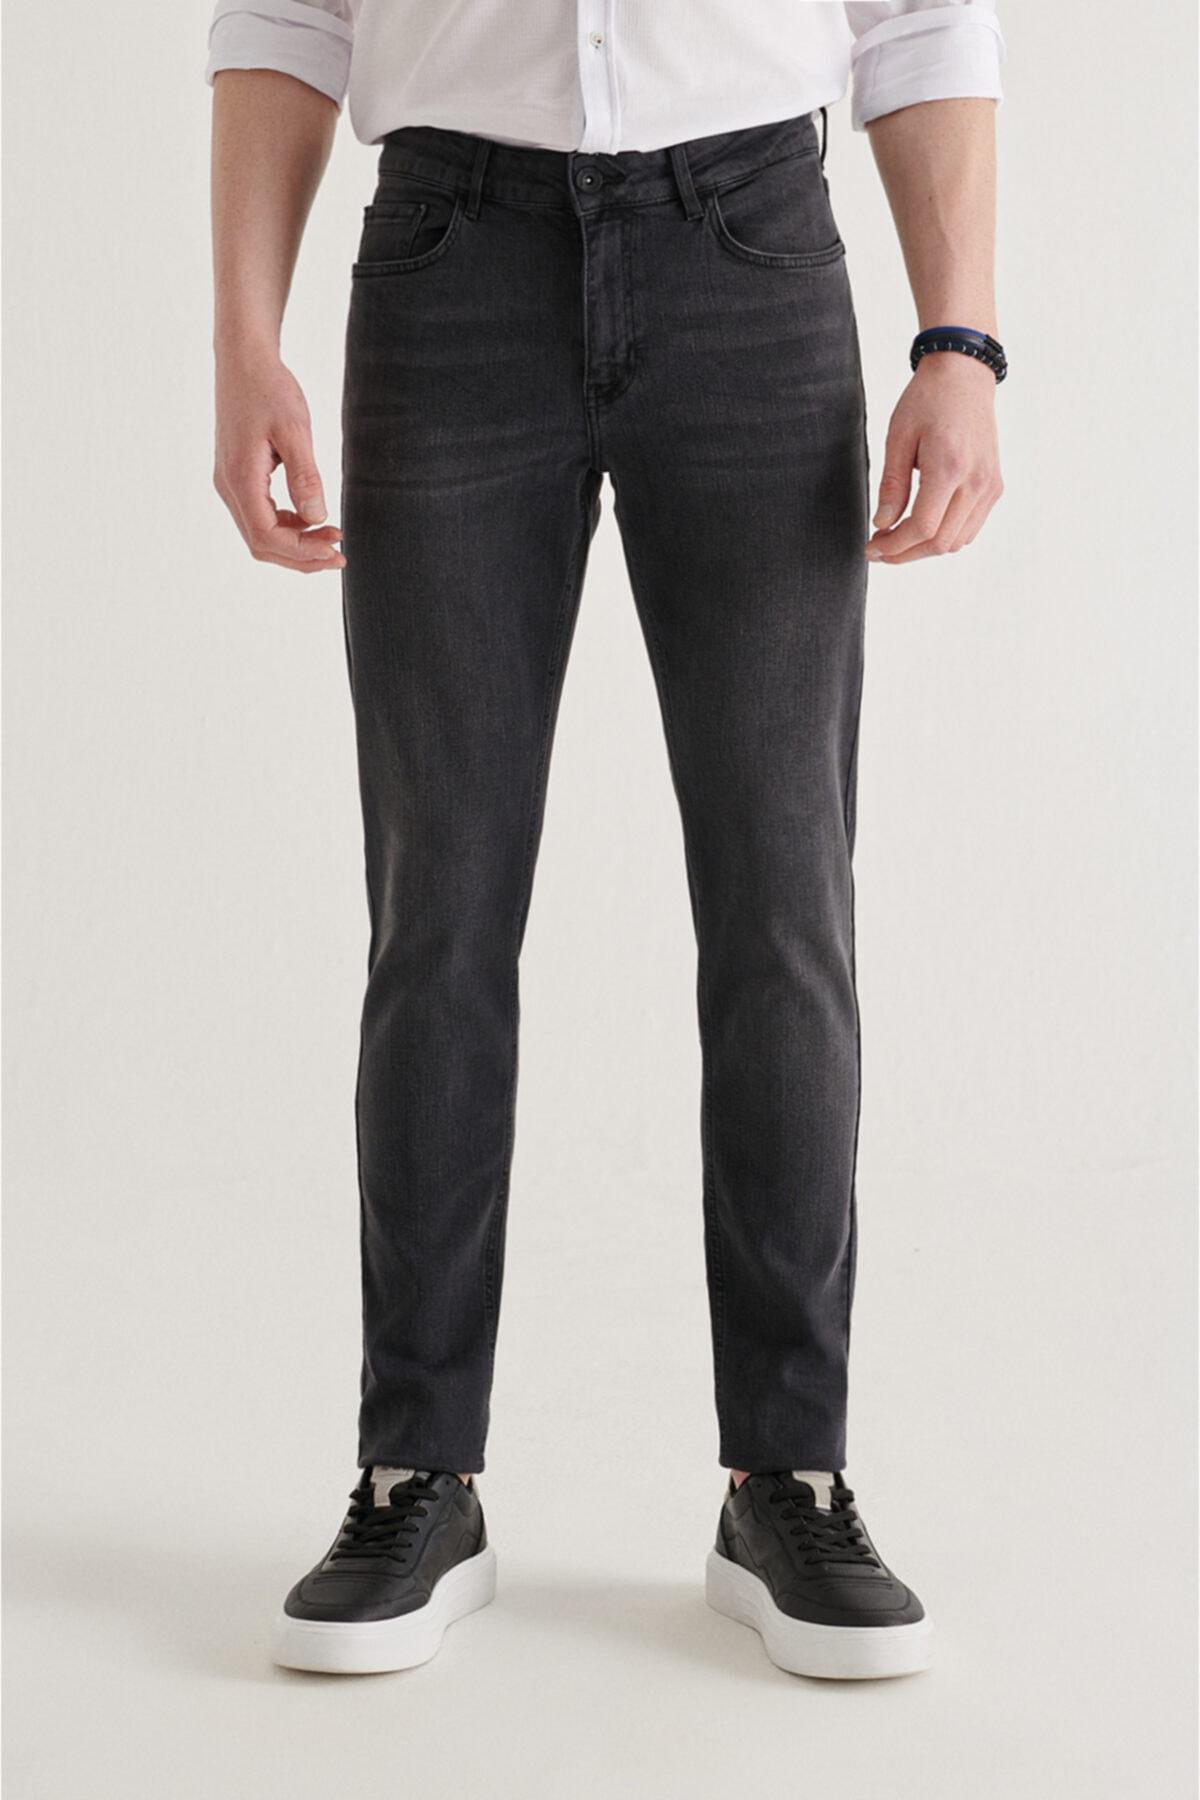 Erkek Antrasit Slim Fit Jean Pantolon A11y3555